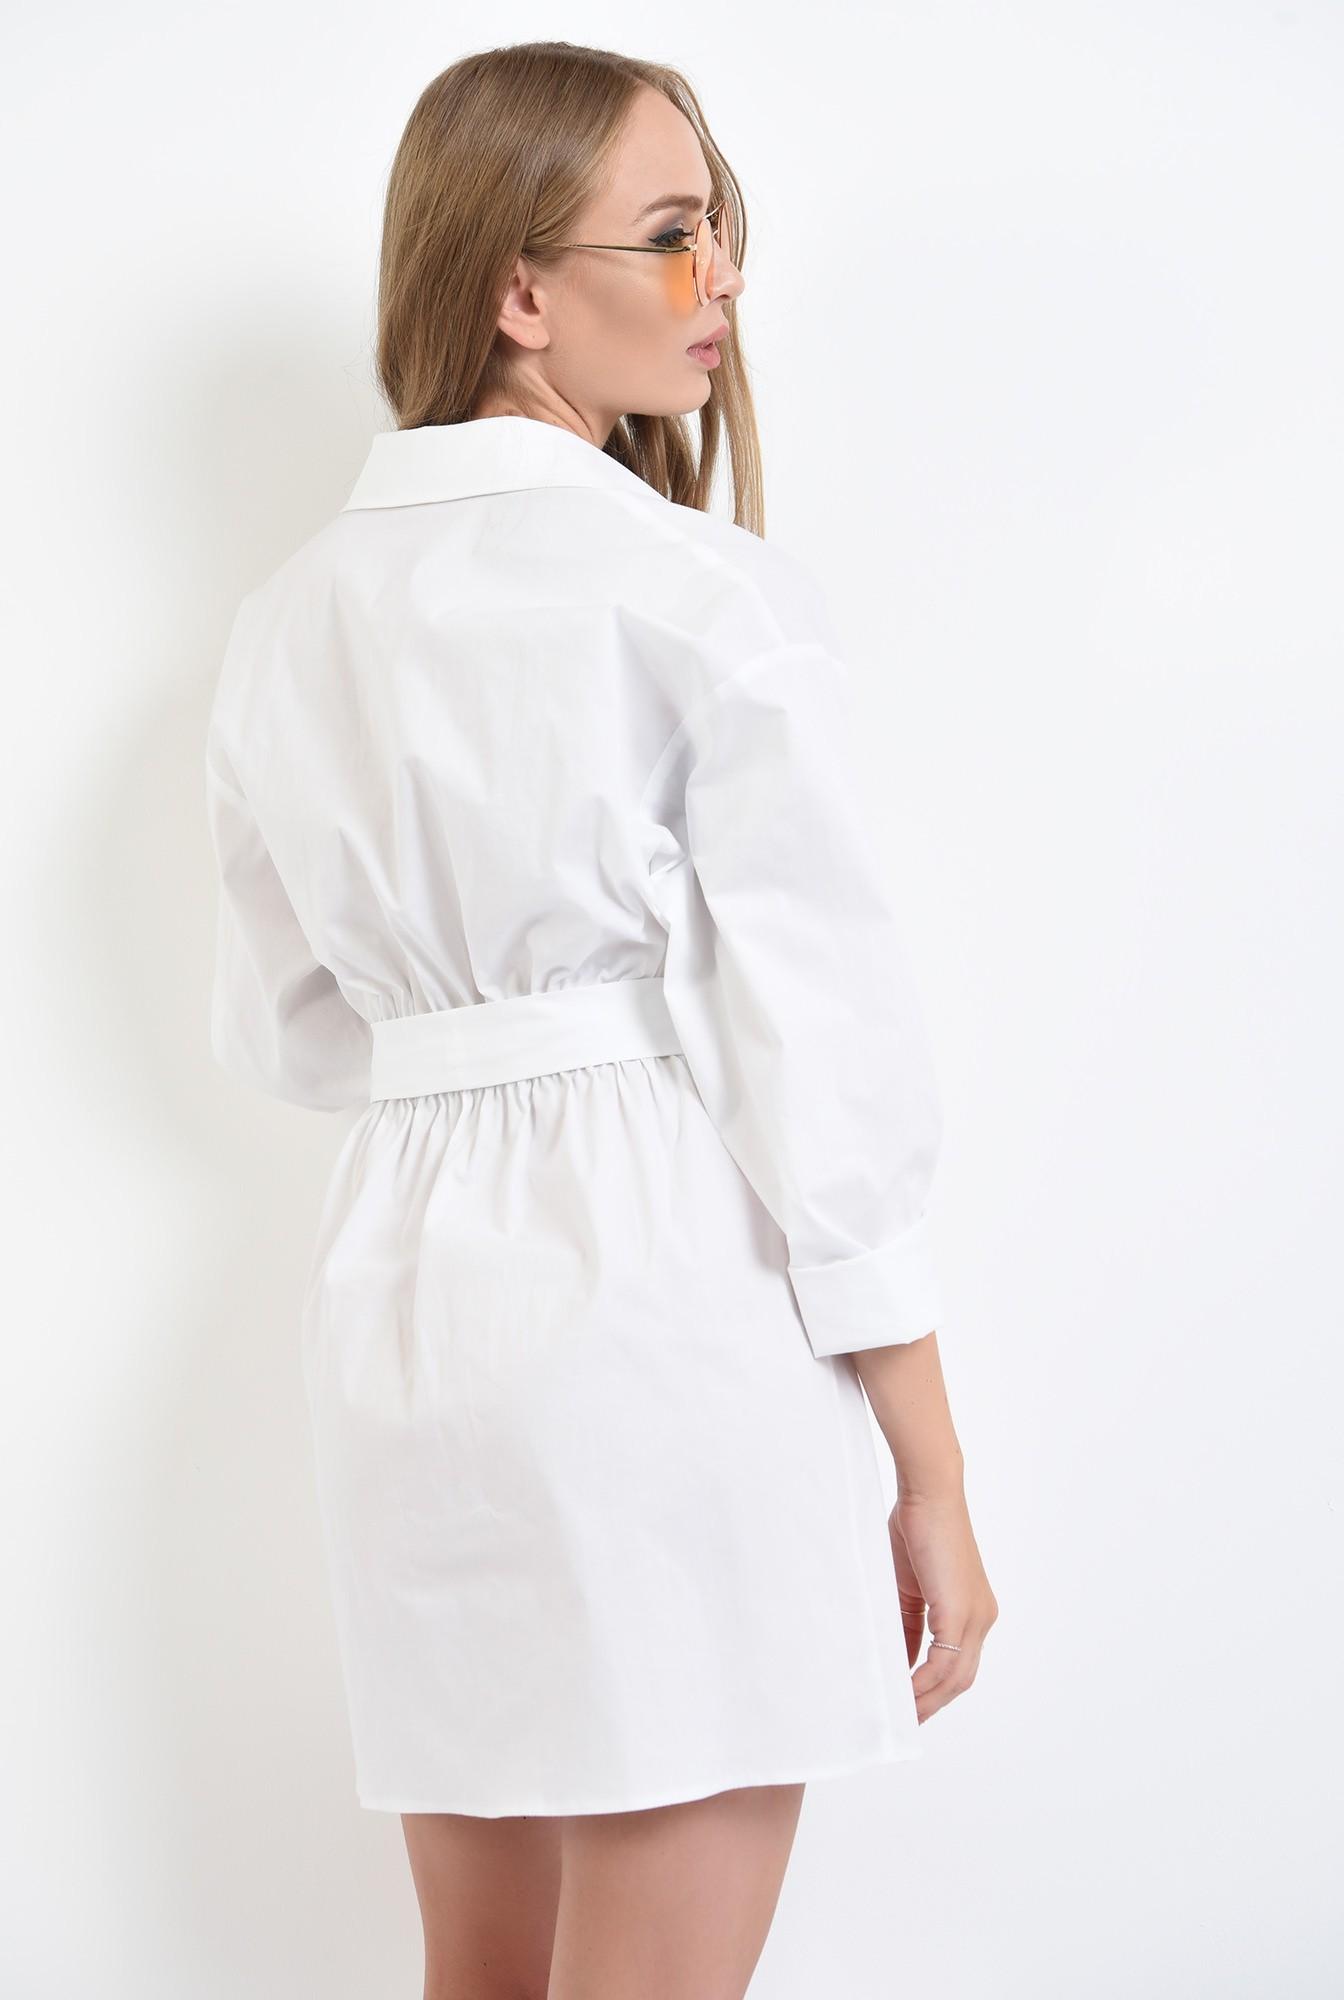 1 - 360 - rochie camasa, mini, cu cordon, nasturi ascunsi, Poema, alb